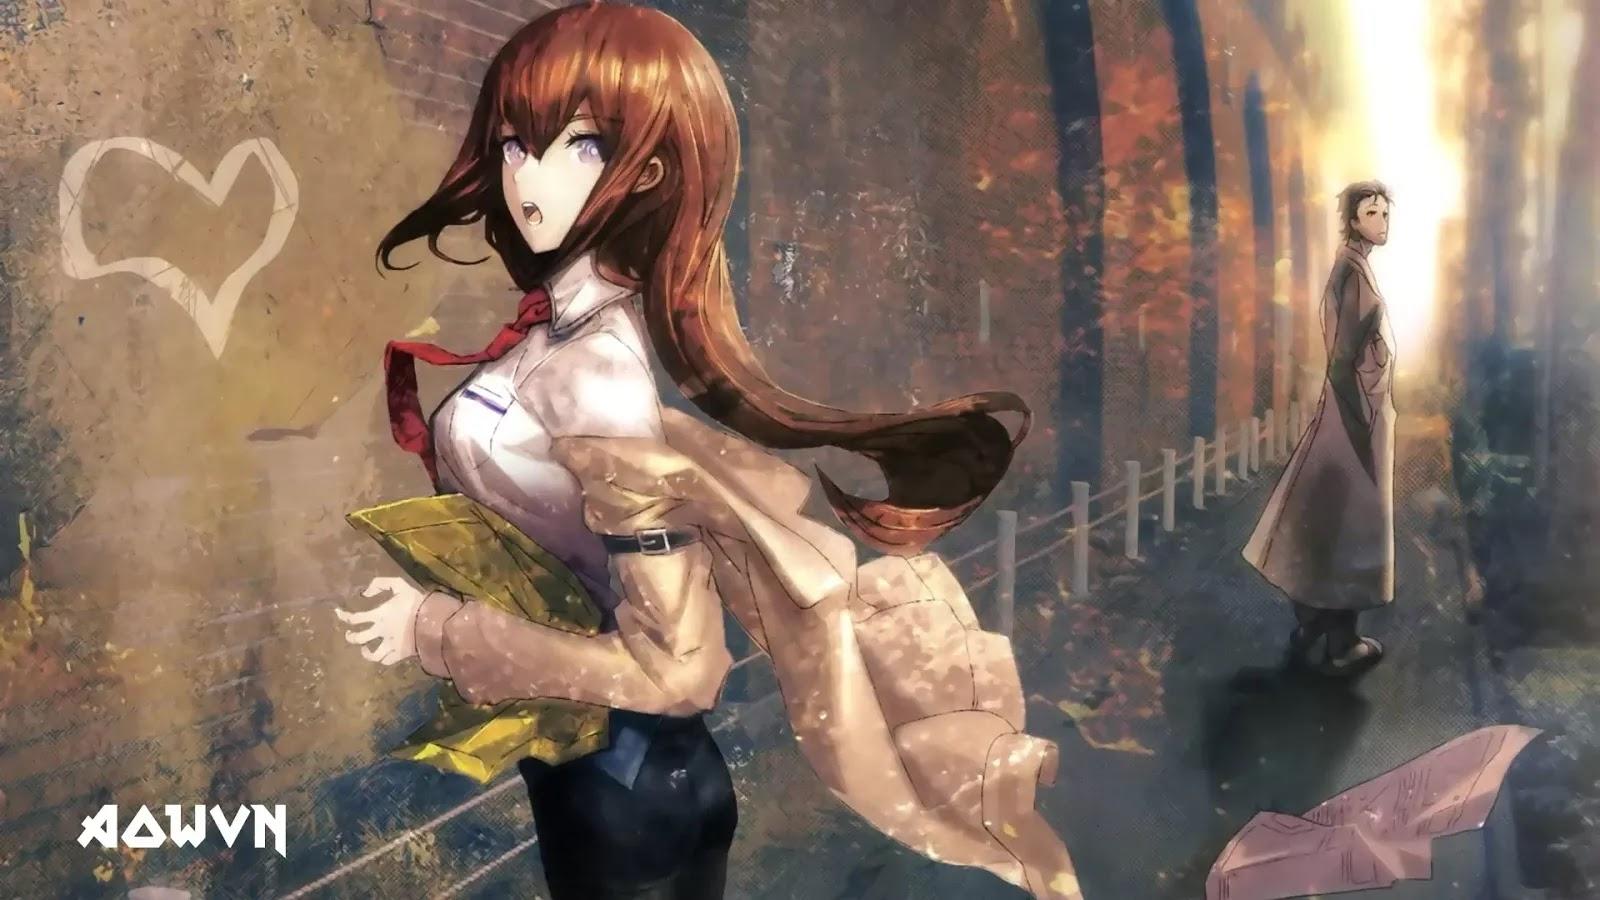 AowVN.org minz%2B%25284%2529 - [ Anime 3gp Mp4 ] Steins;Gate + Specials + Movie | Vietsub - Tuyệt Phẩm Cực Hay